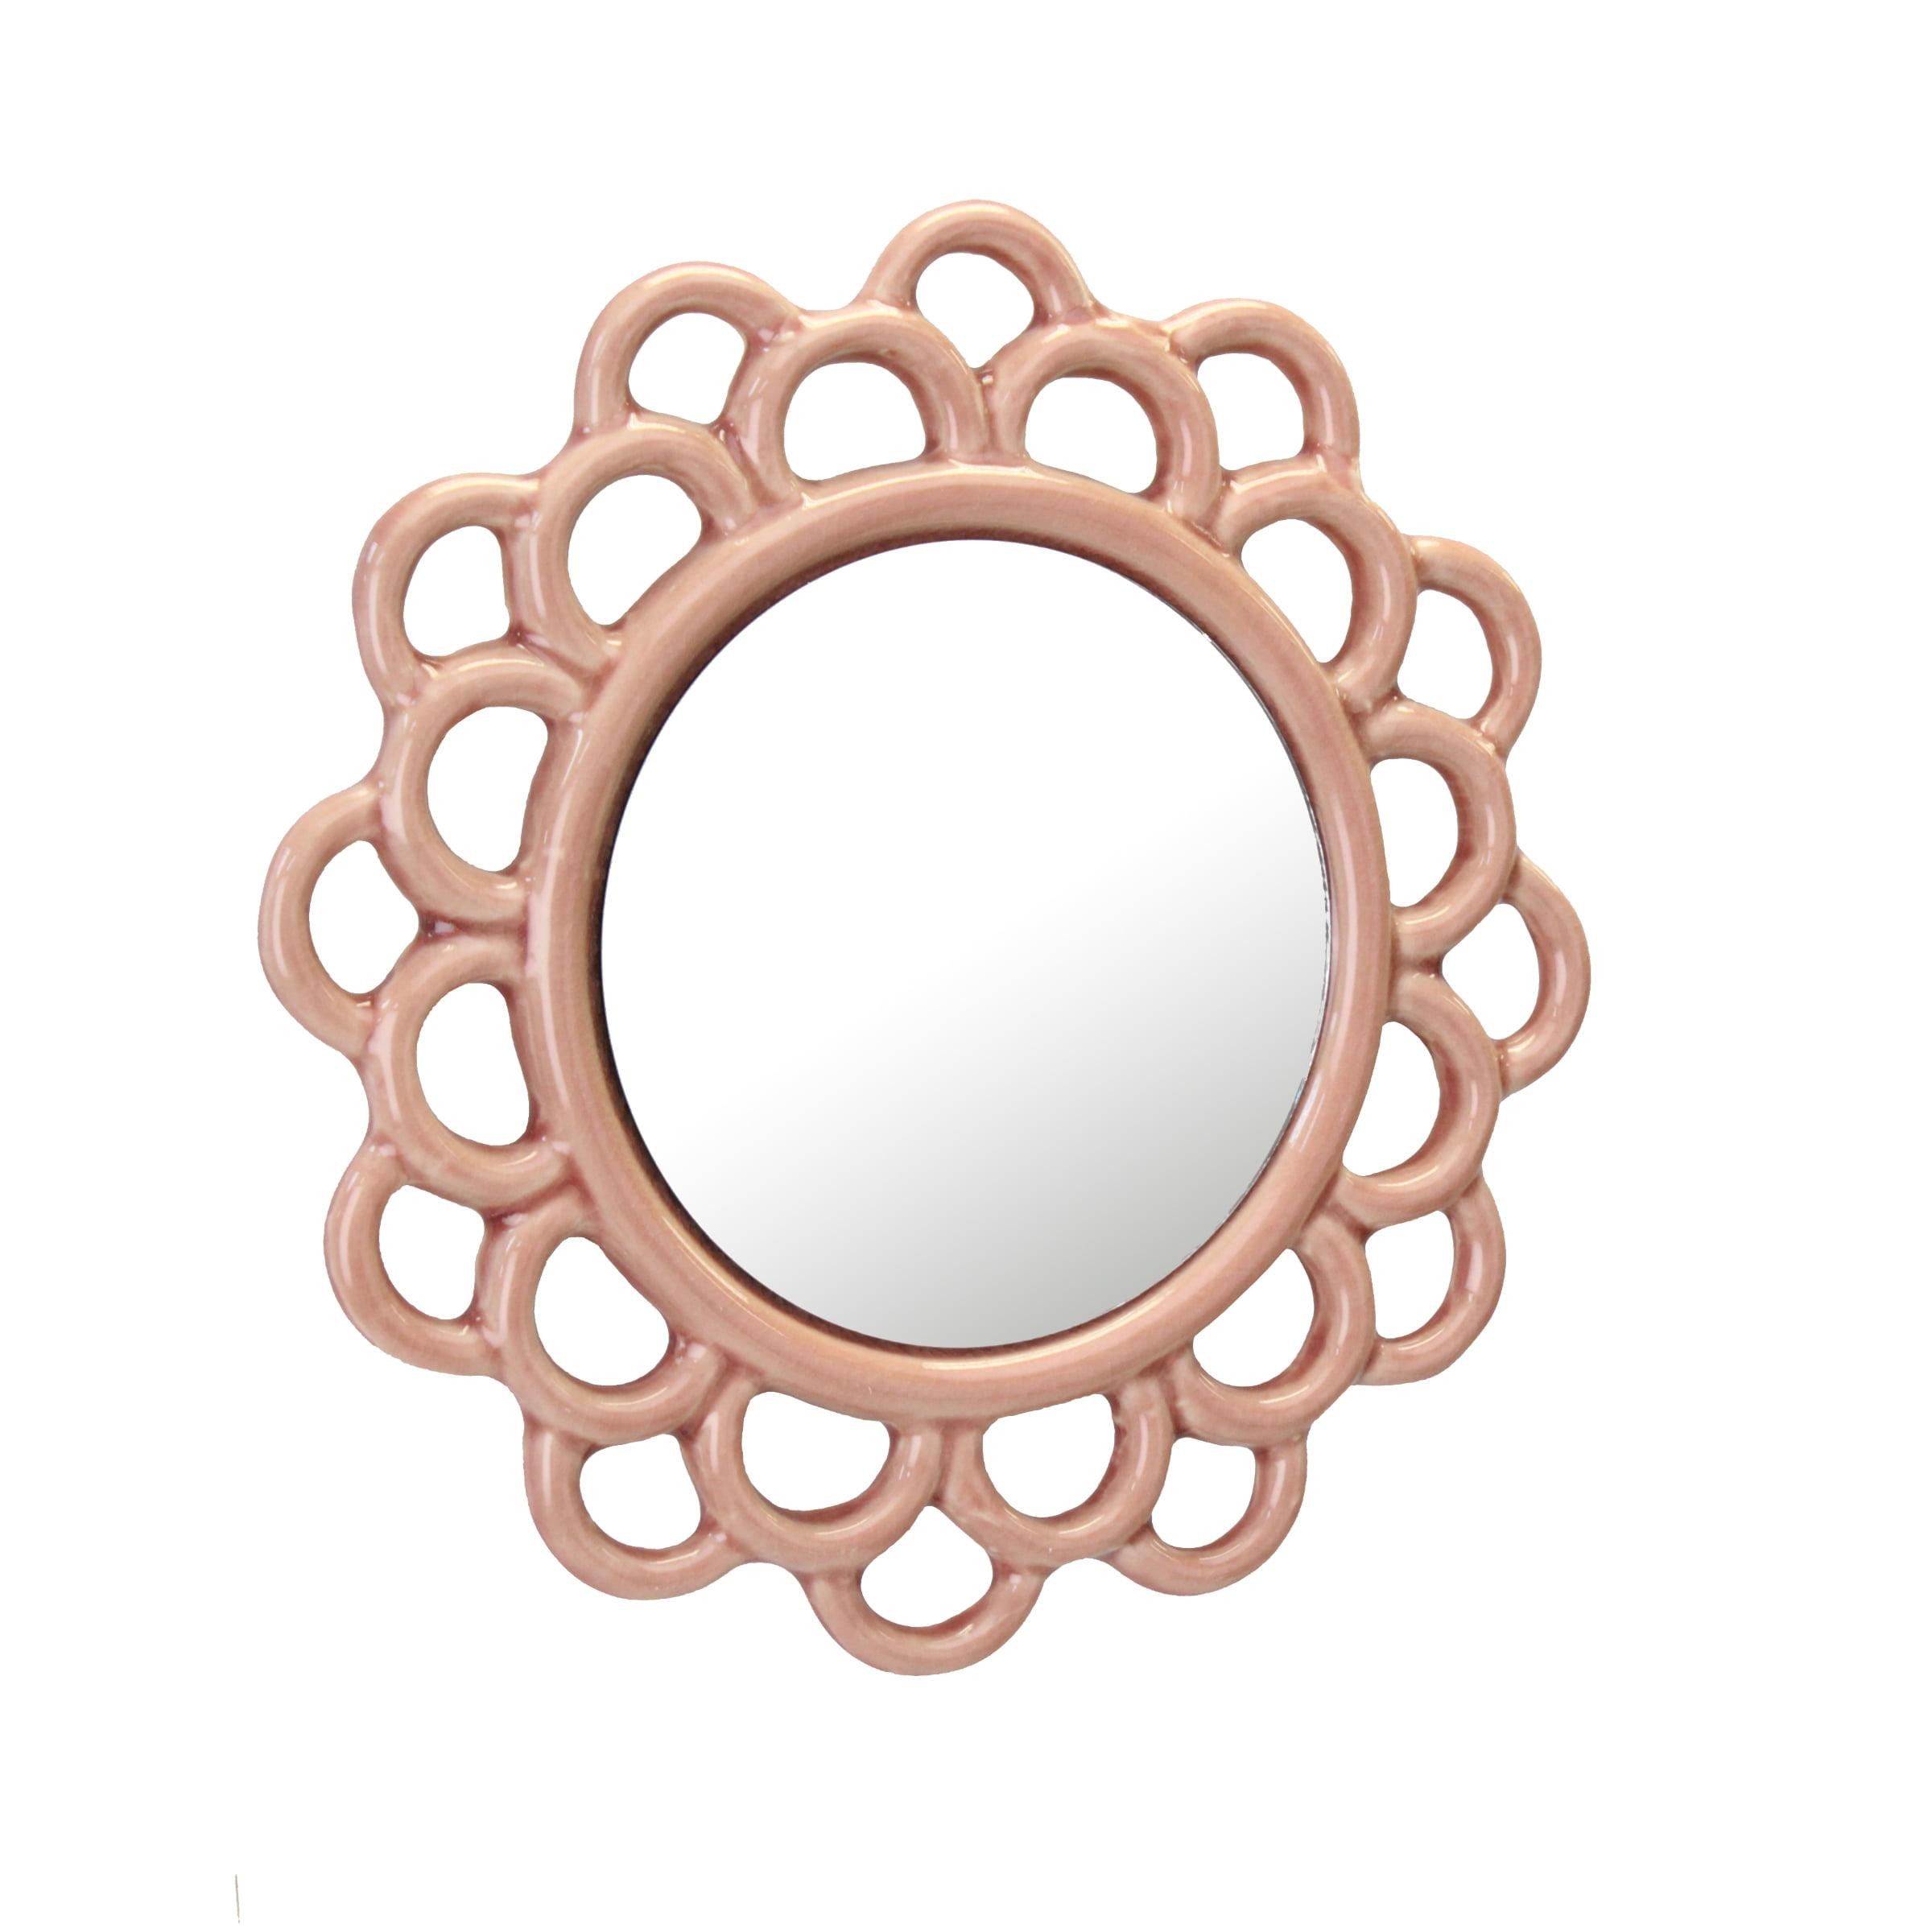 Stonebriar Decorative Round Pink Dusty Rose Cutout Ceramic Wall Hanging Mirror Walmart Com Walmart Com